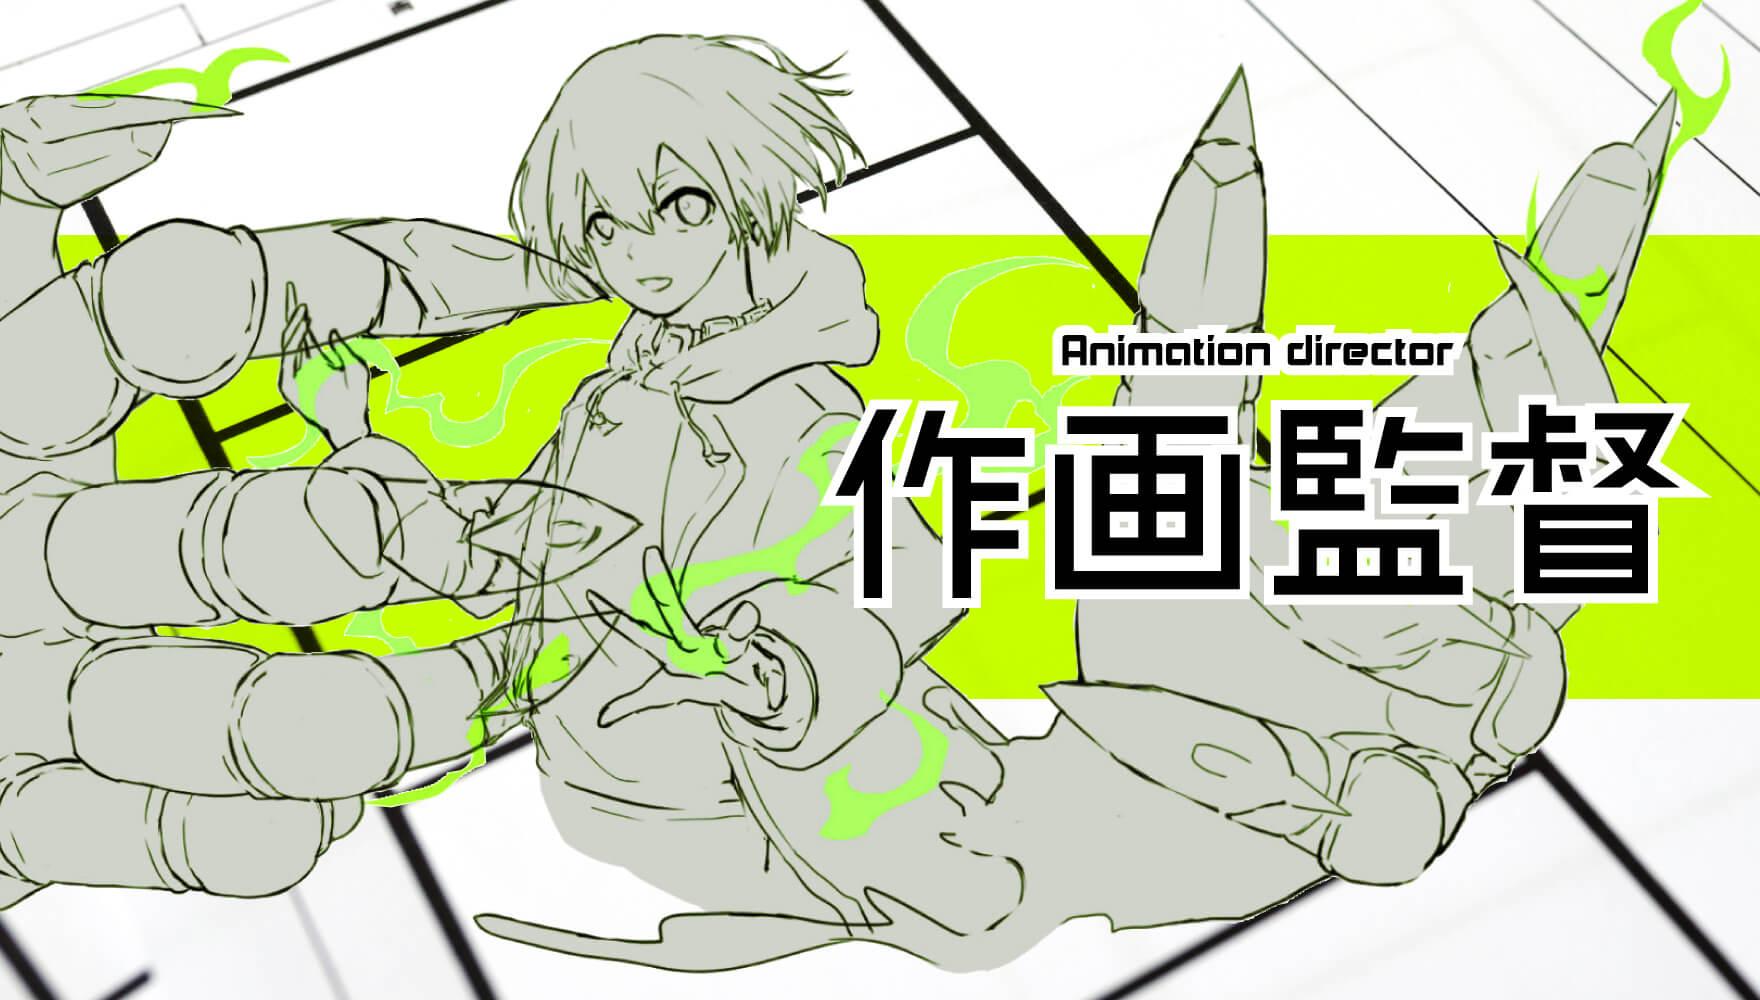 Animation_director